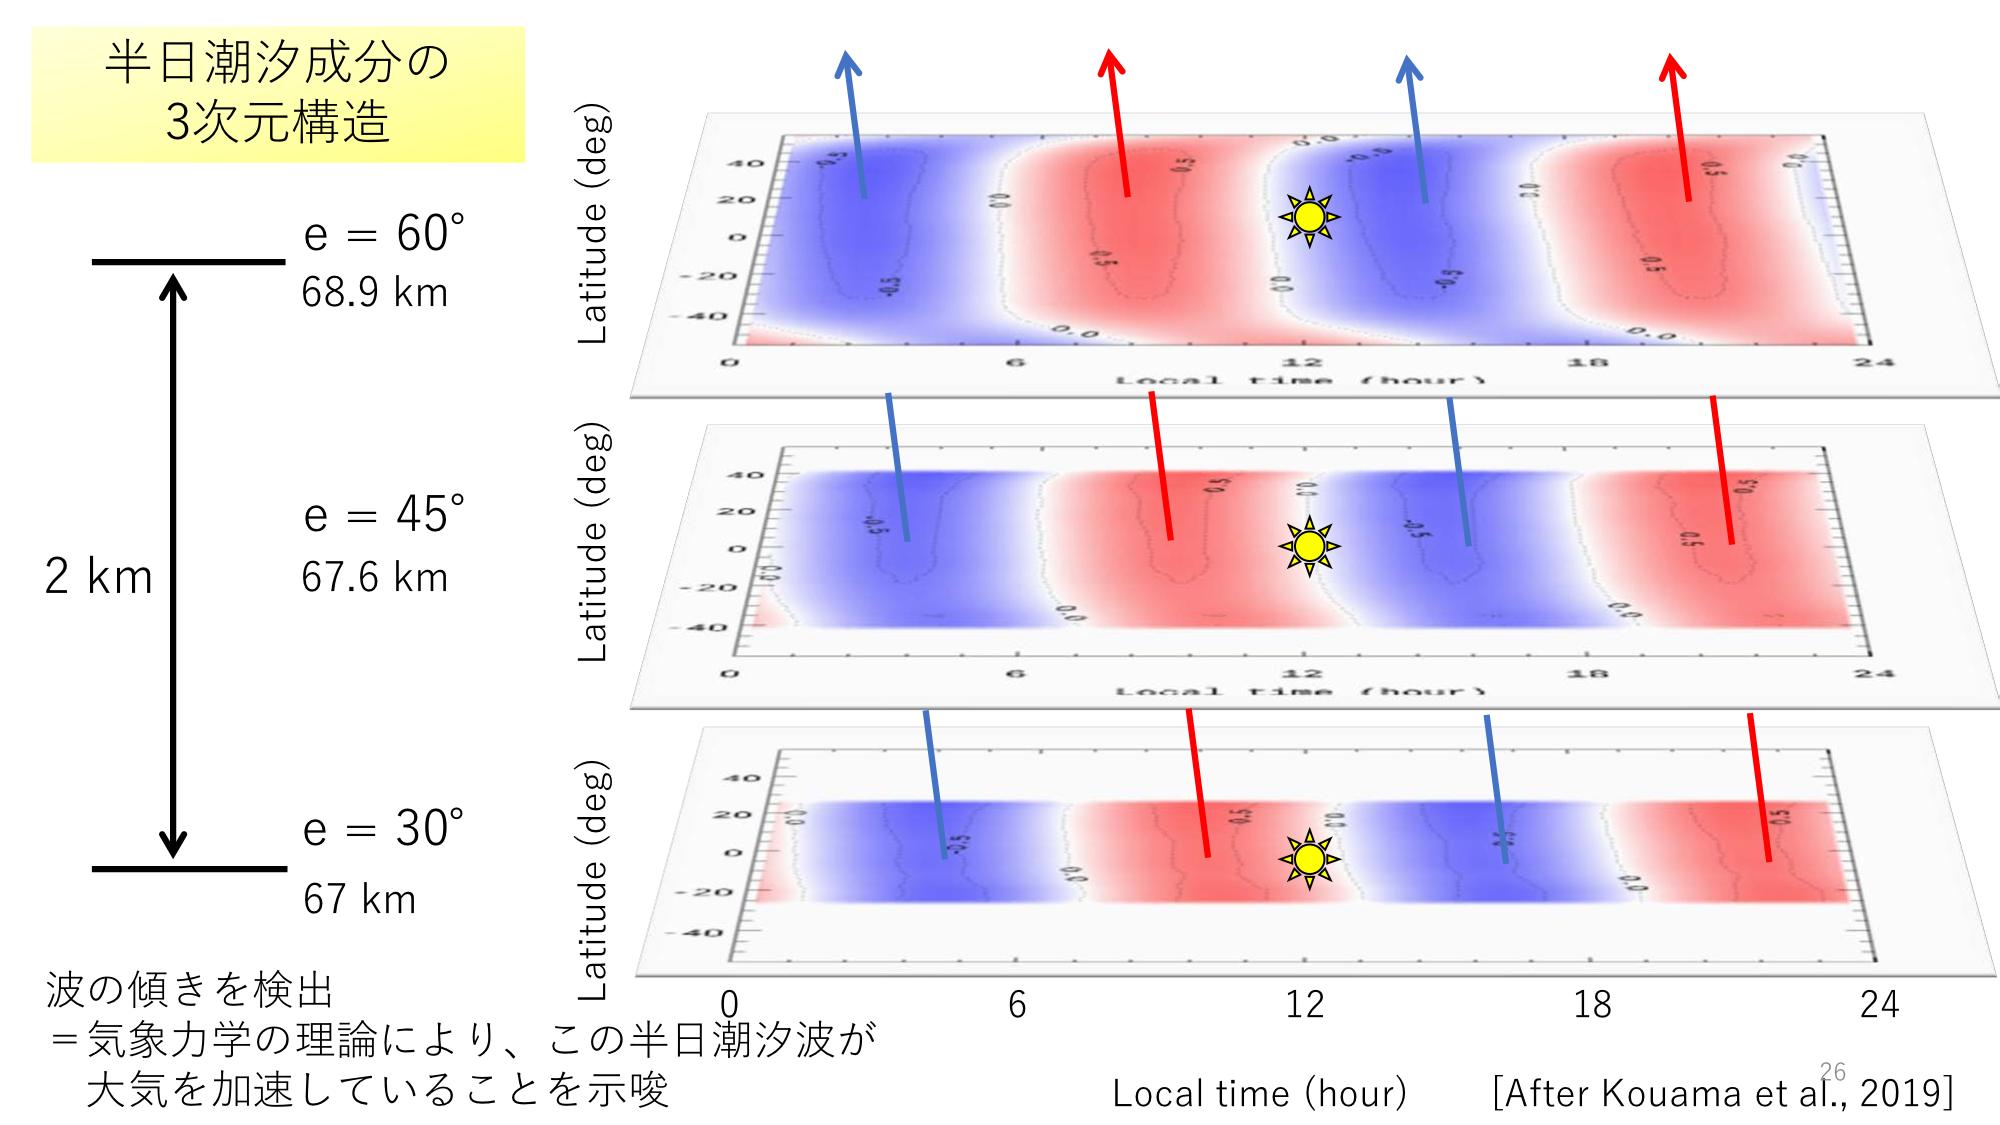 f:id:Imamura:20191119205619p:plain